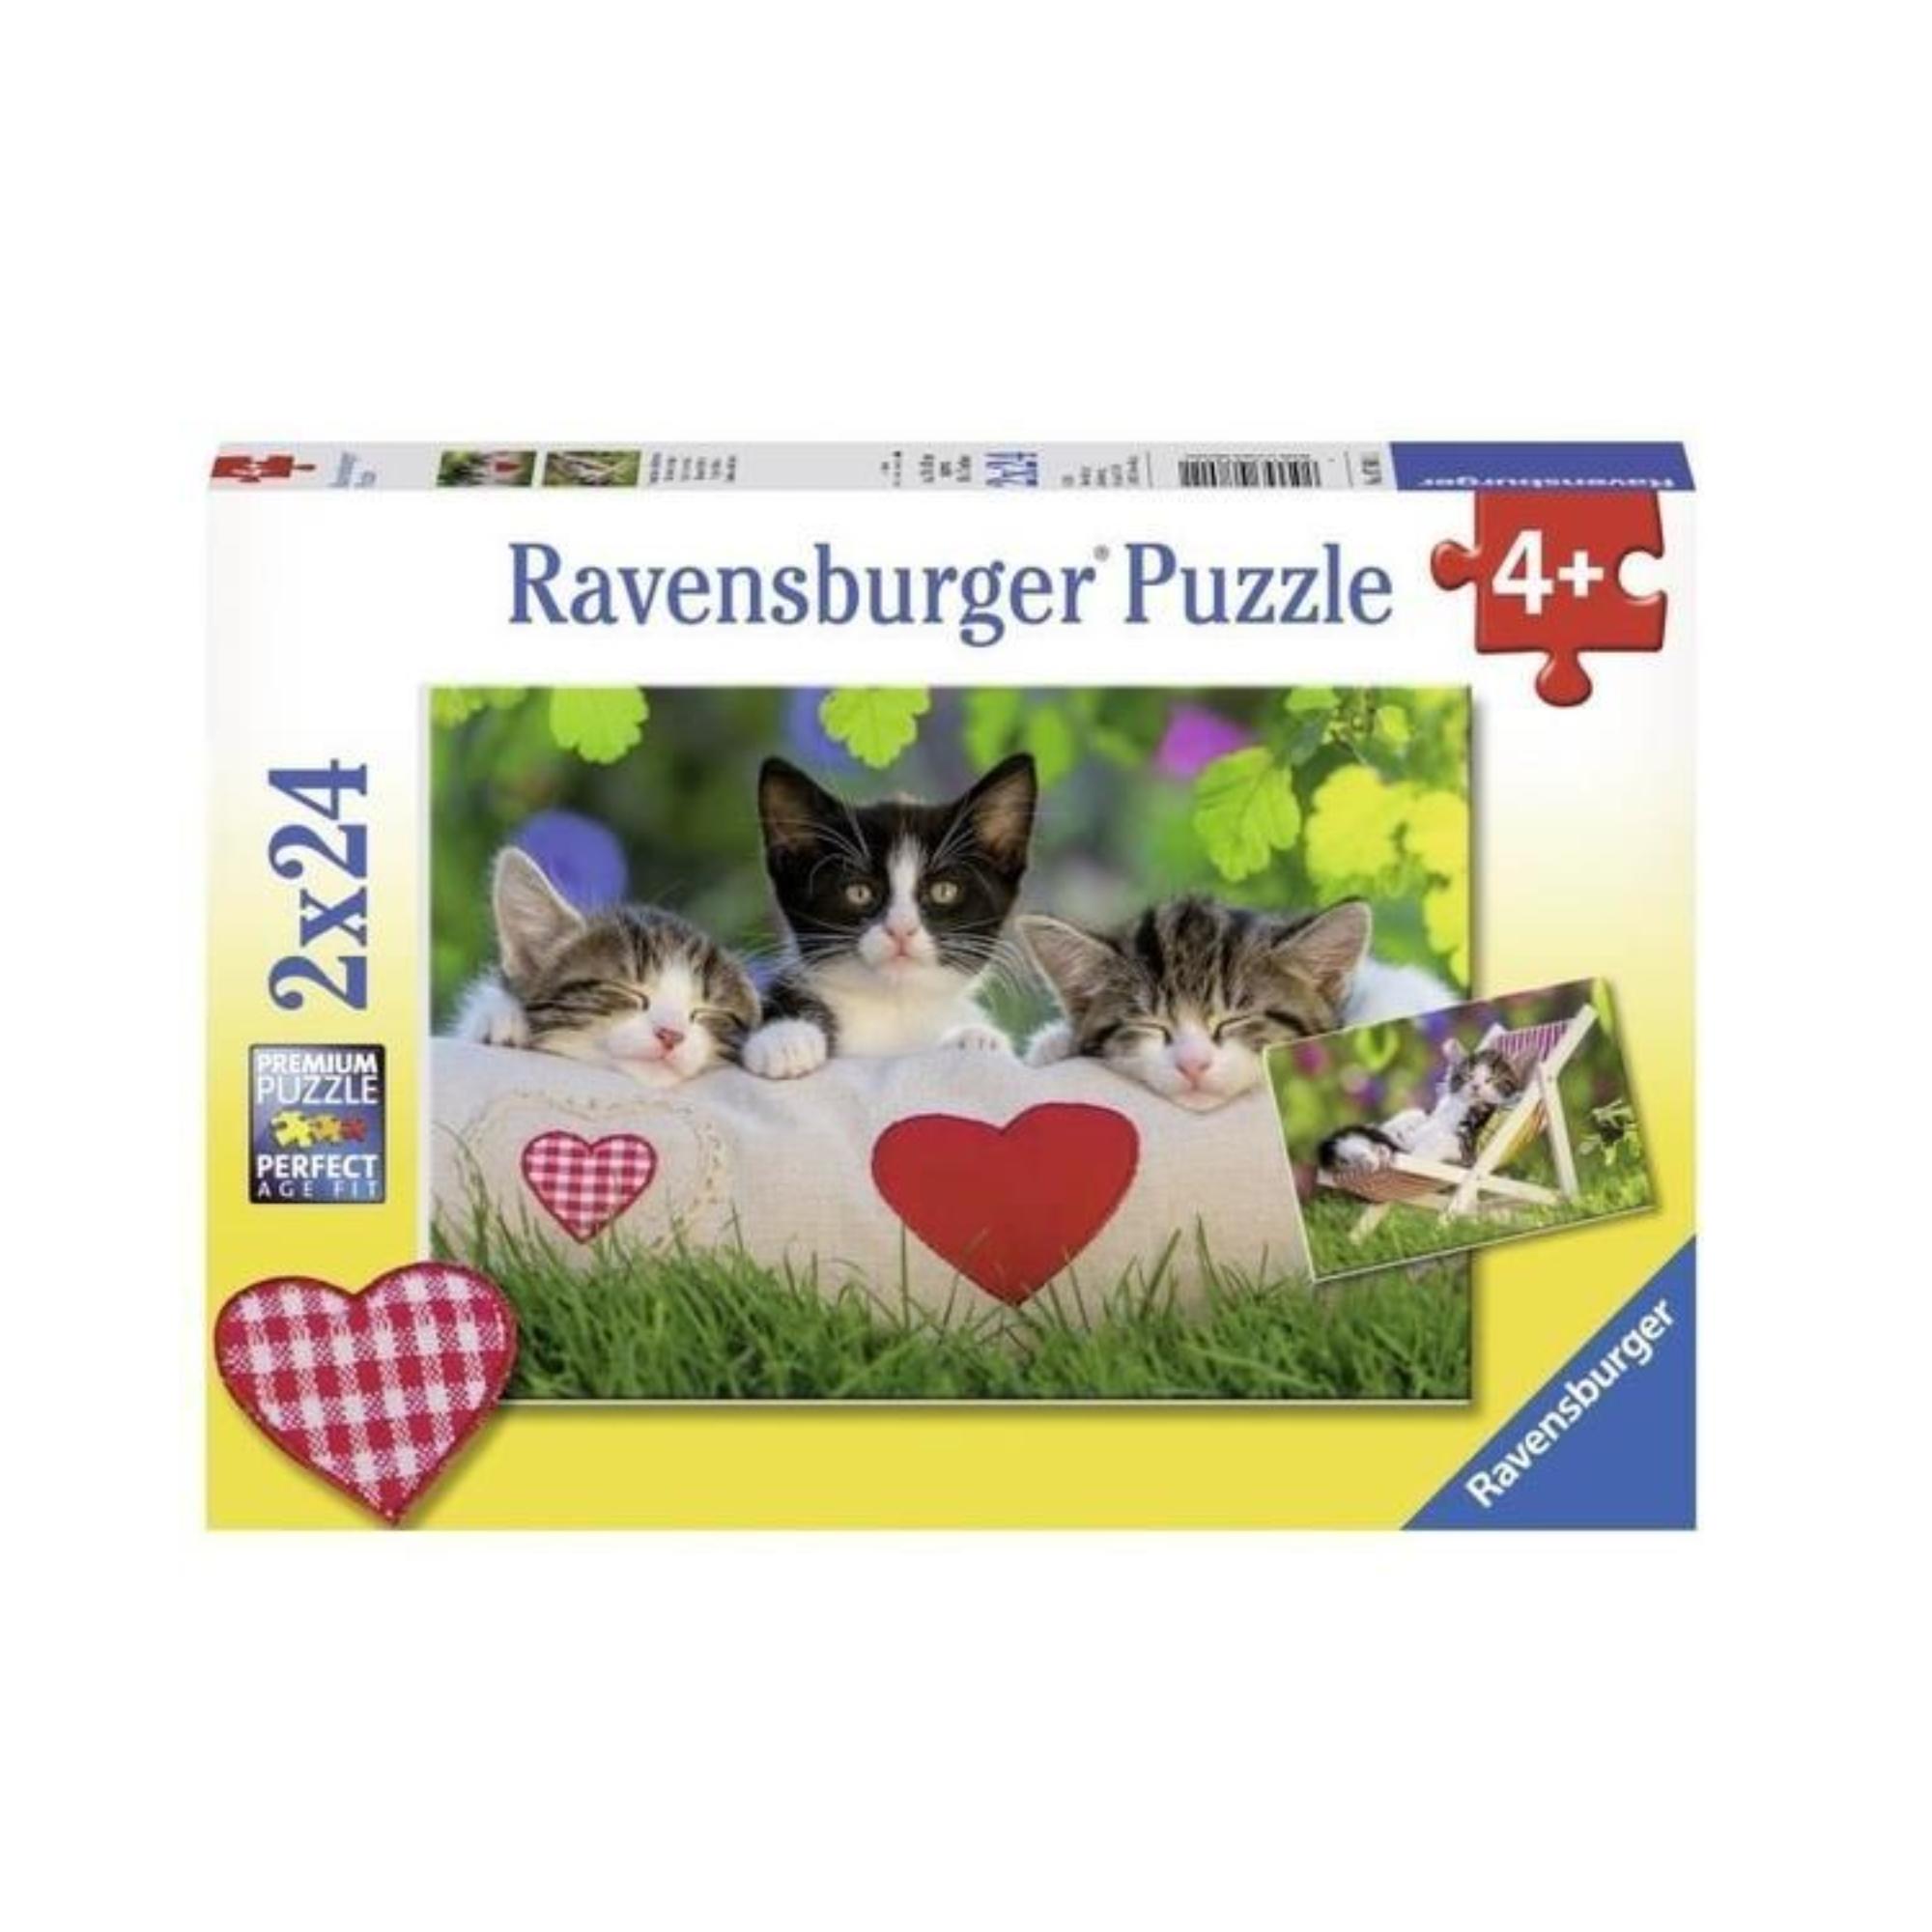 Ravensburger Puzzle 2 x 24: Chatons au repos